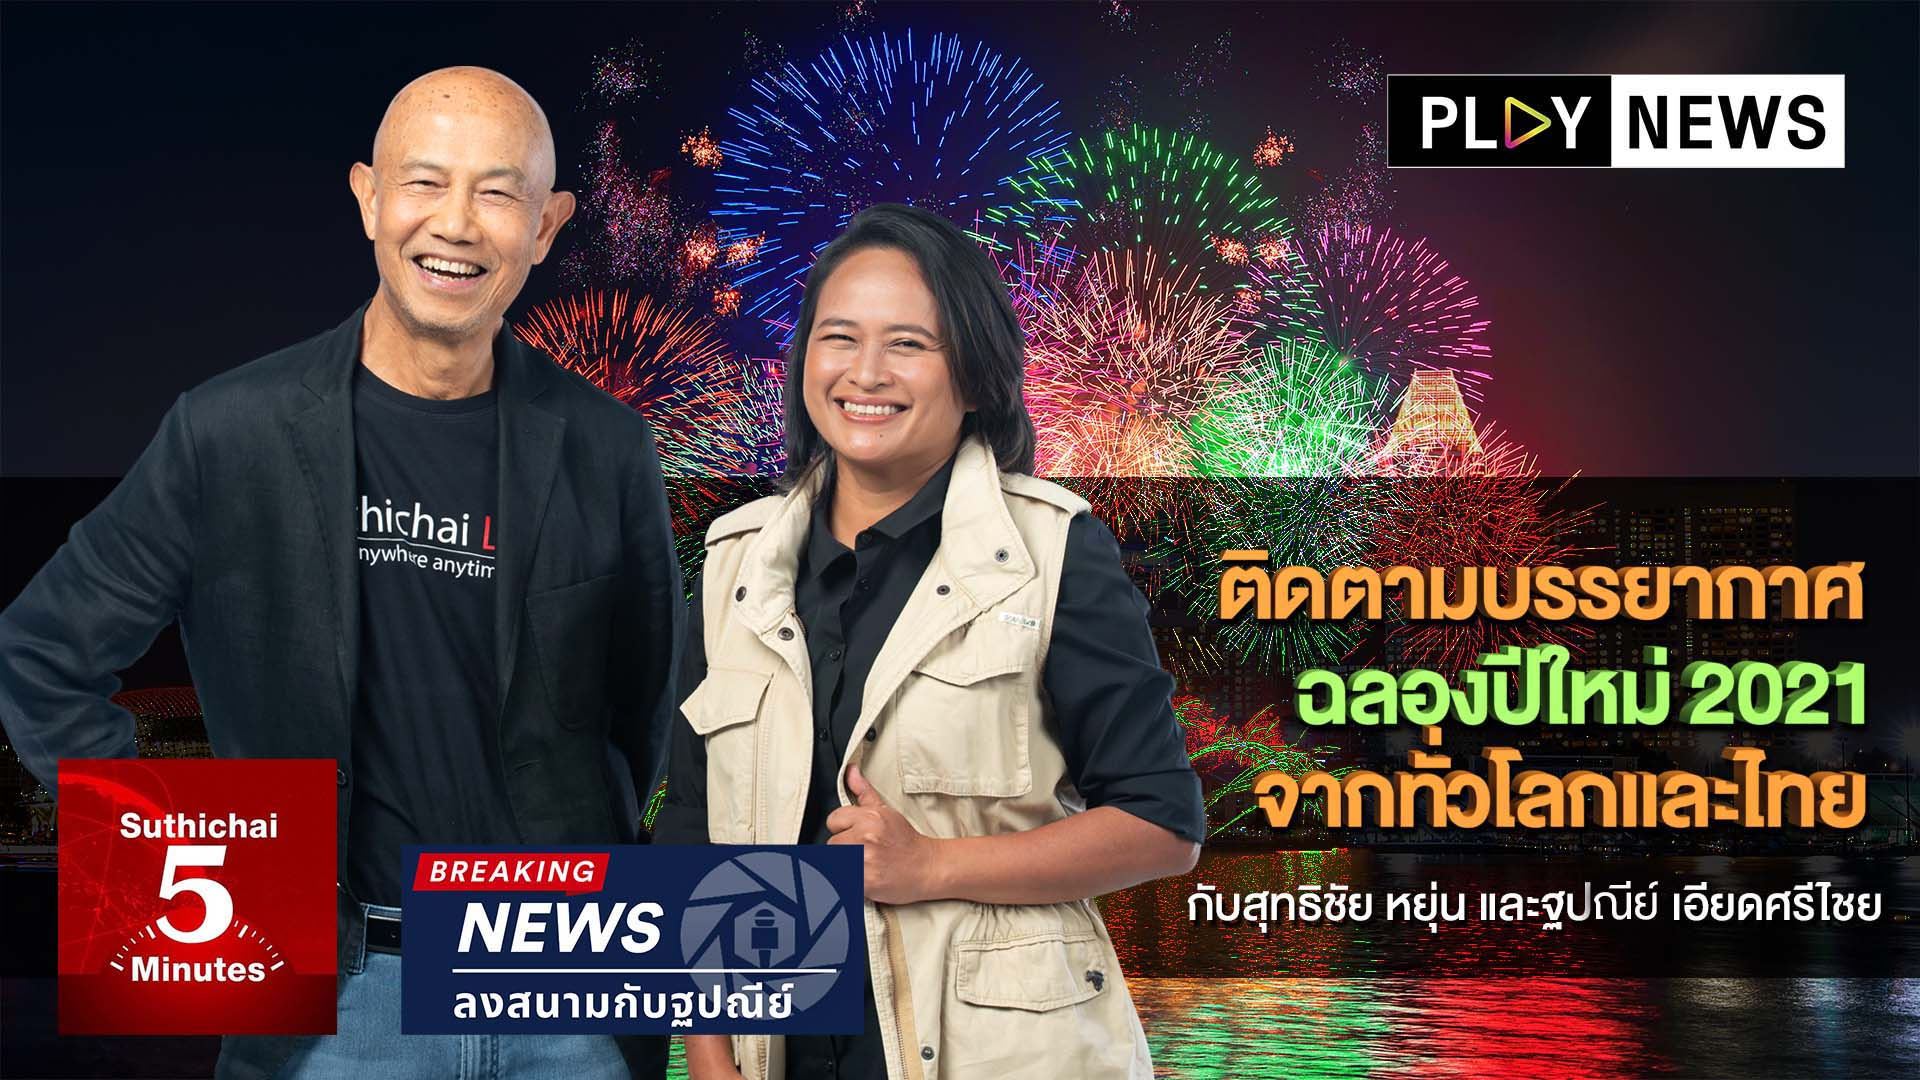 PLAY NEWS ชวนคนไทยติดตามบรรยากาศฉลองปีใหม่ 2021 จากทั่วโลกและไทย กับสุทธิชัย หยุ่น และ แยม ฐปณีย์ บน AIS PLAY